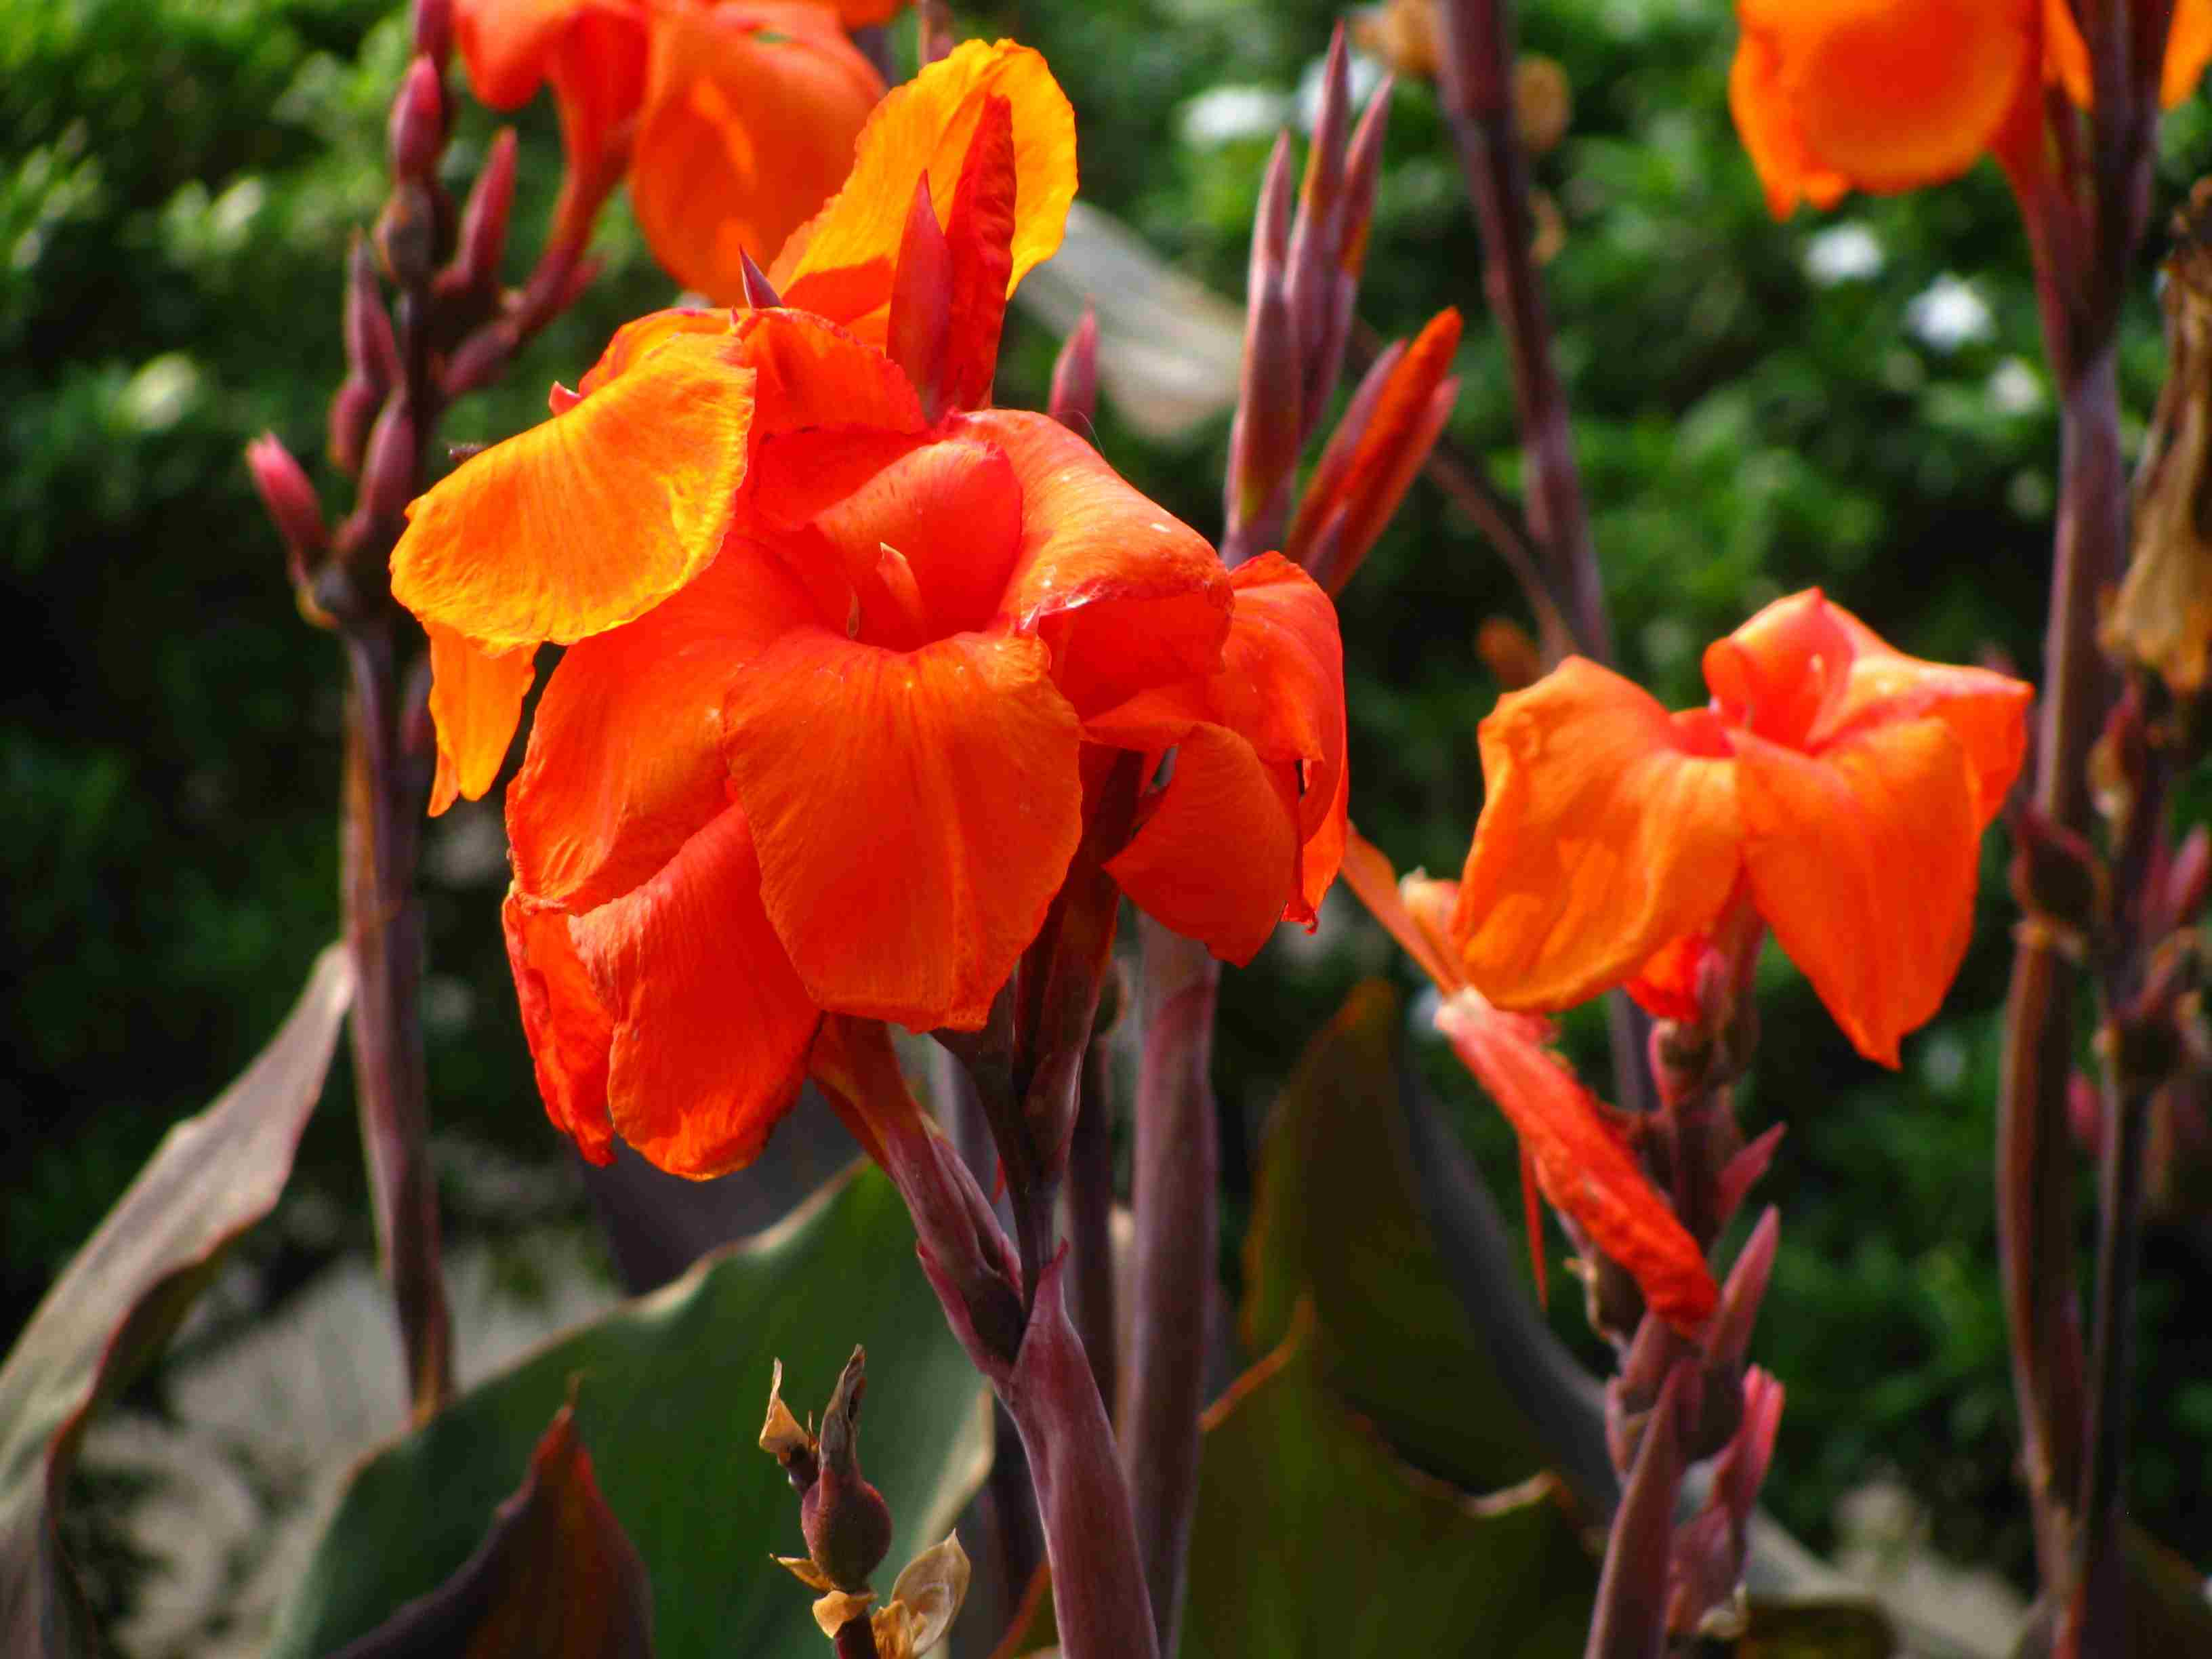 Pictures of orange flower varieties izmirmasajfo Choice Image